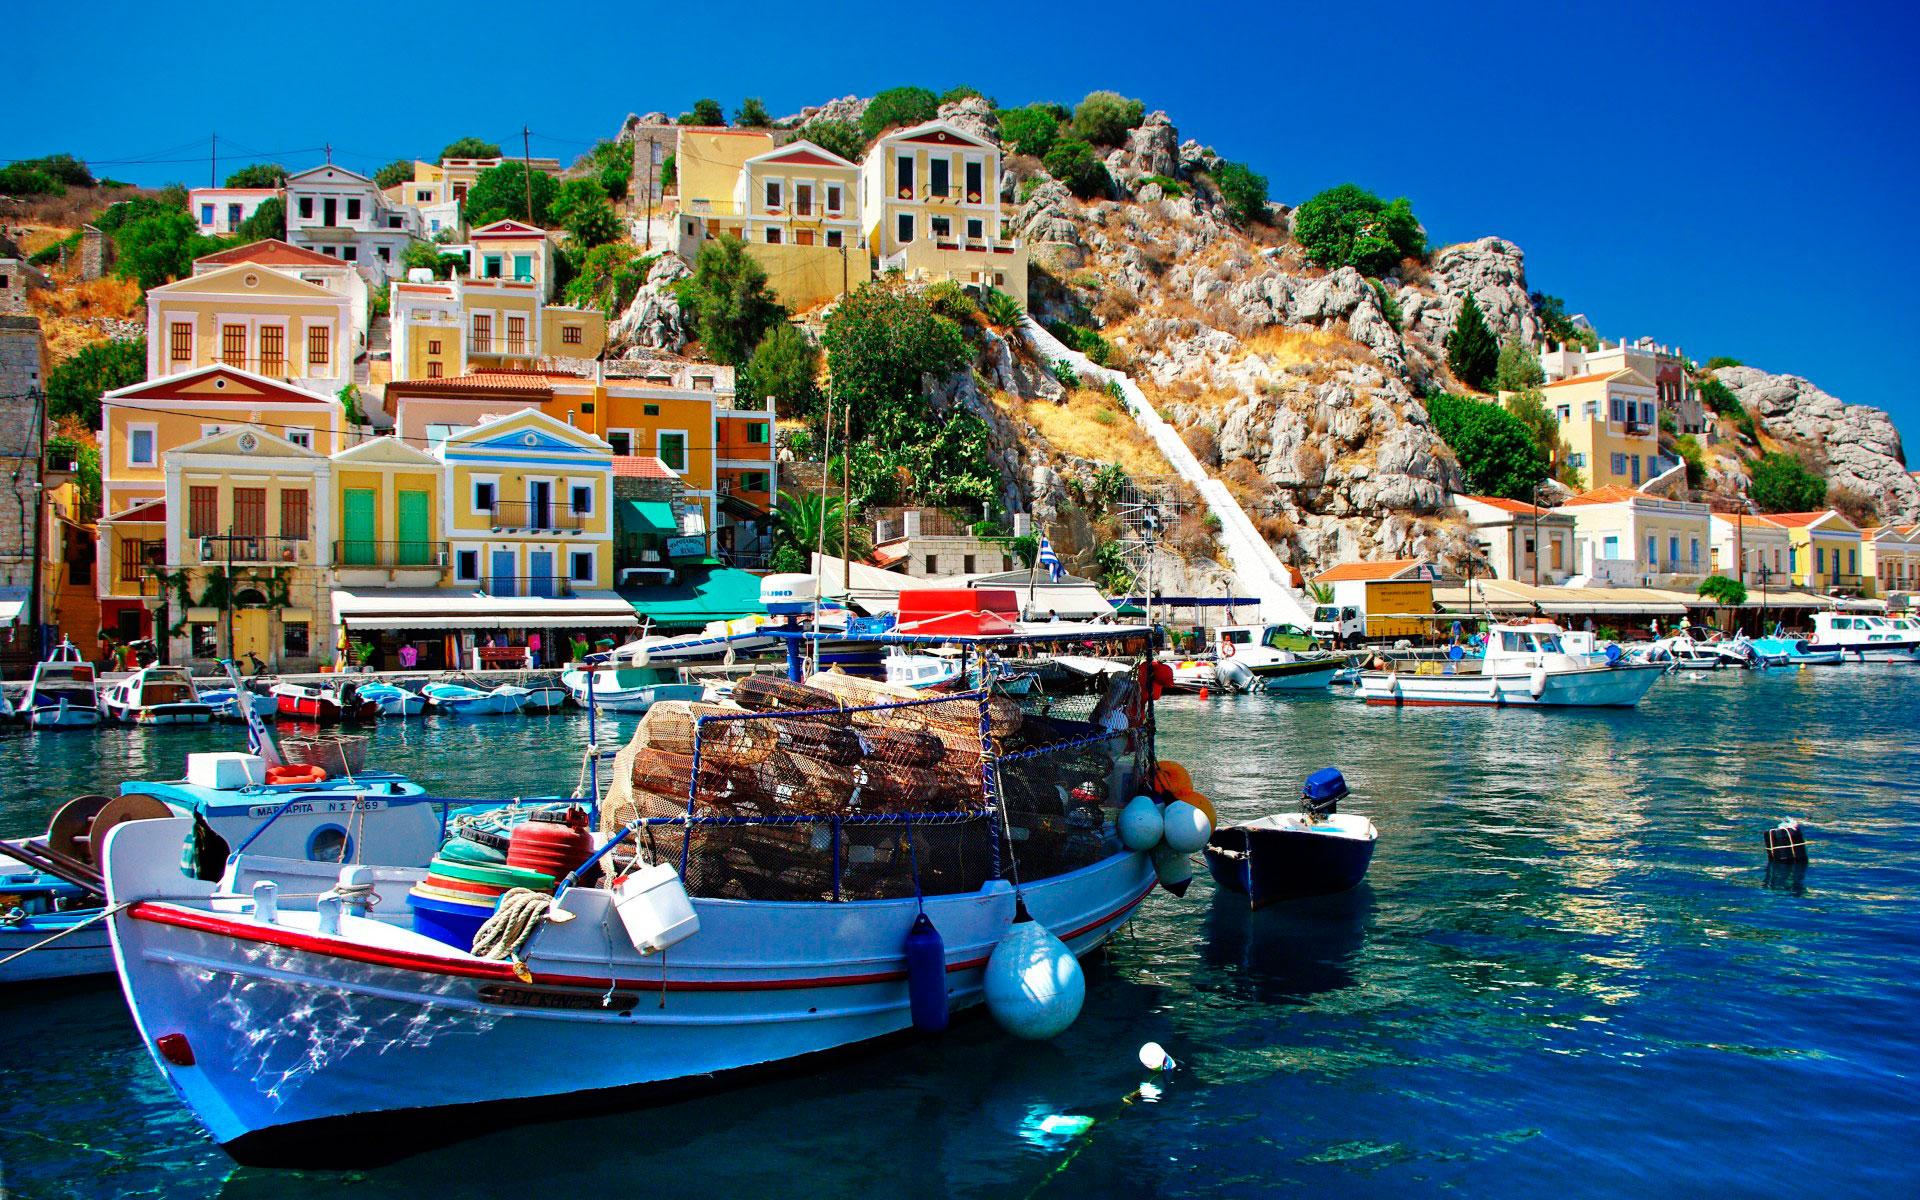 greciya - Ранее бронирование - Греция